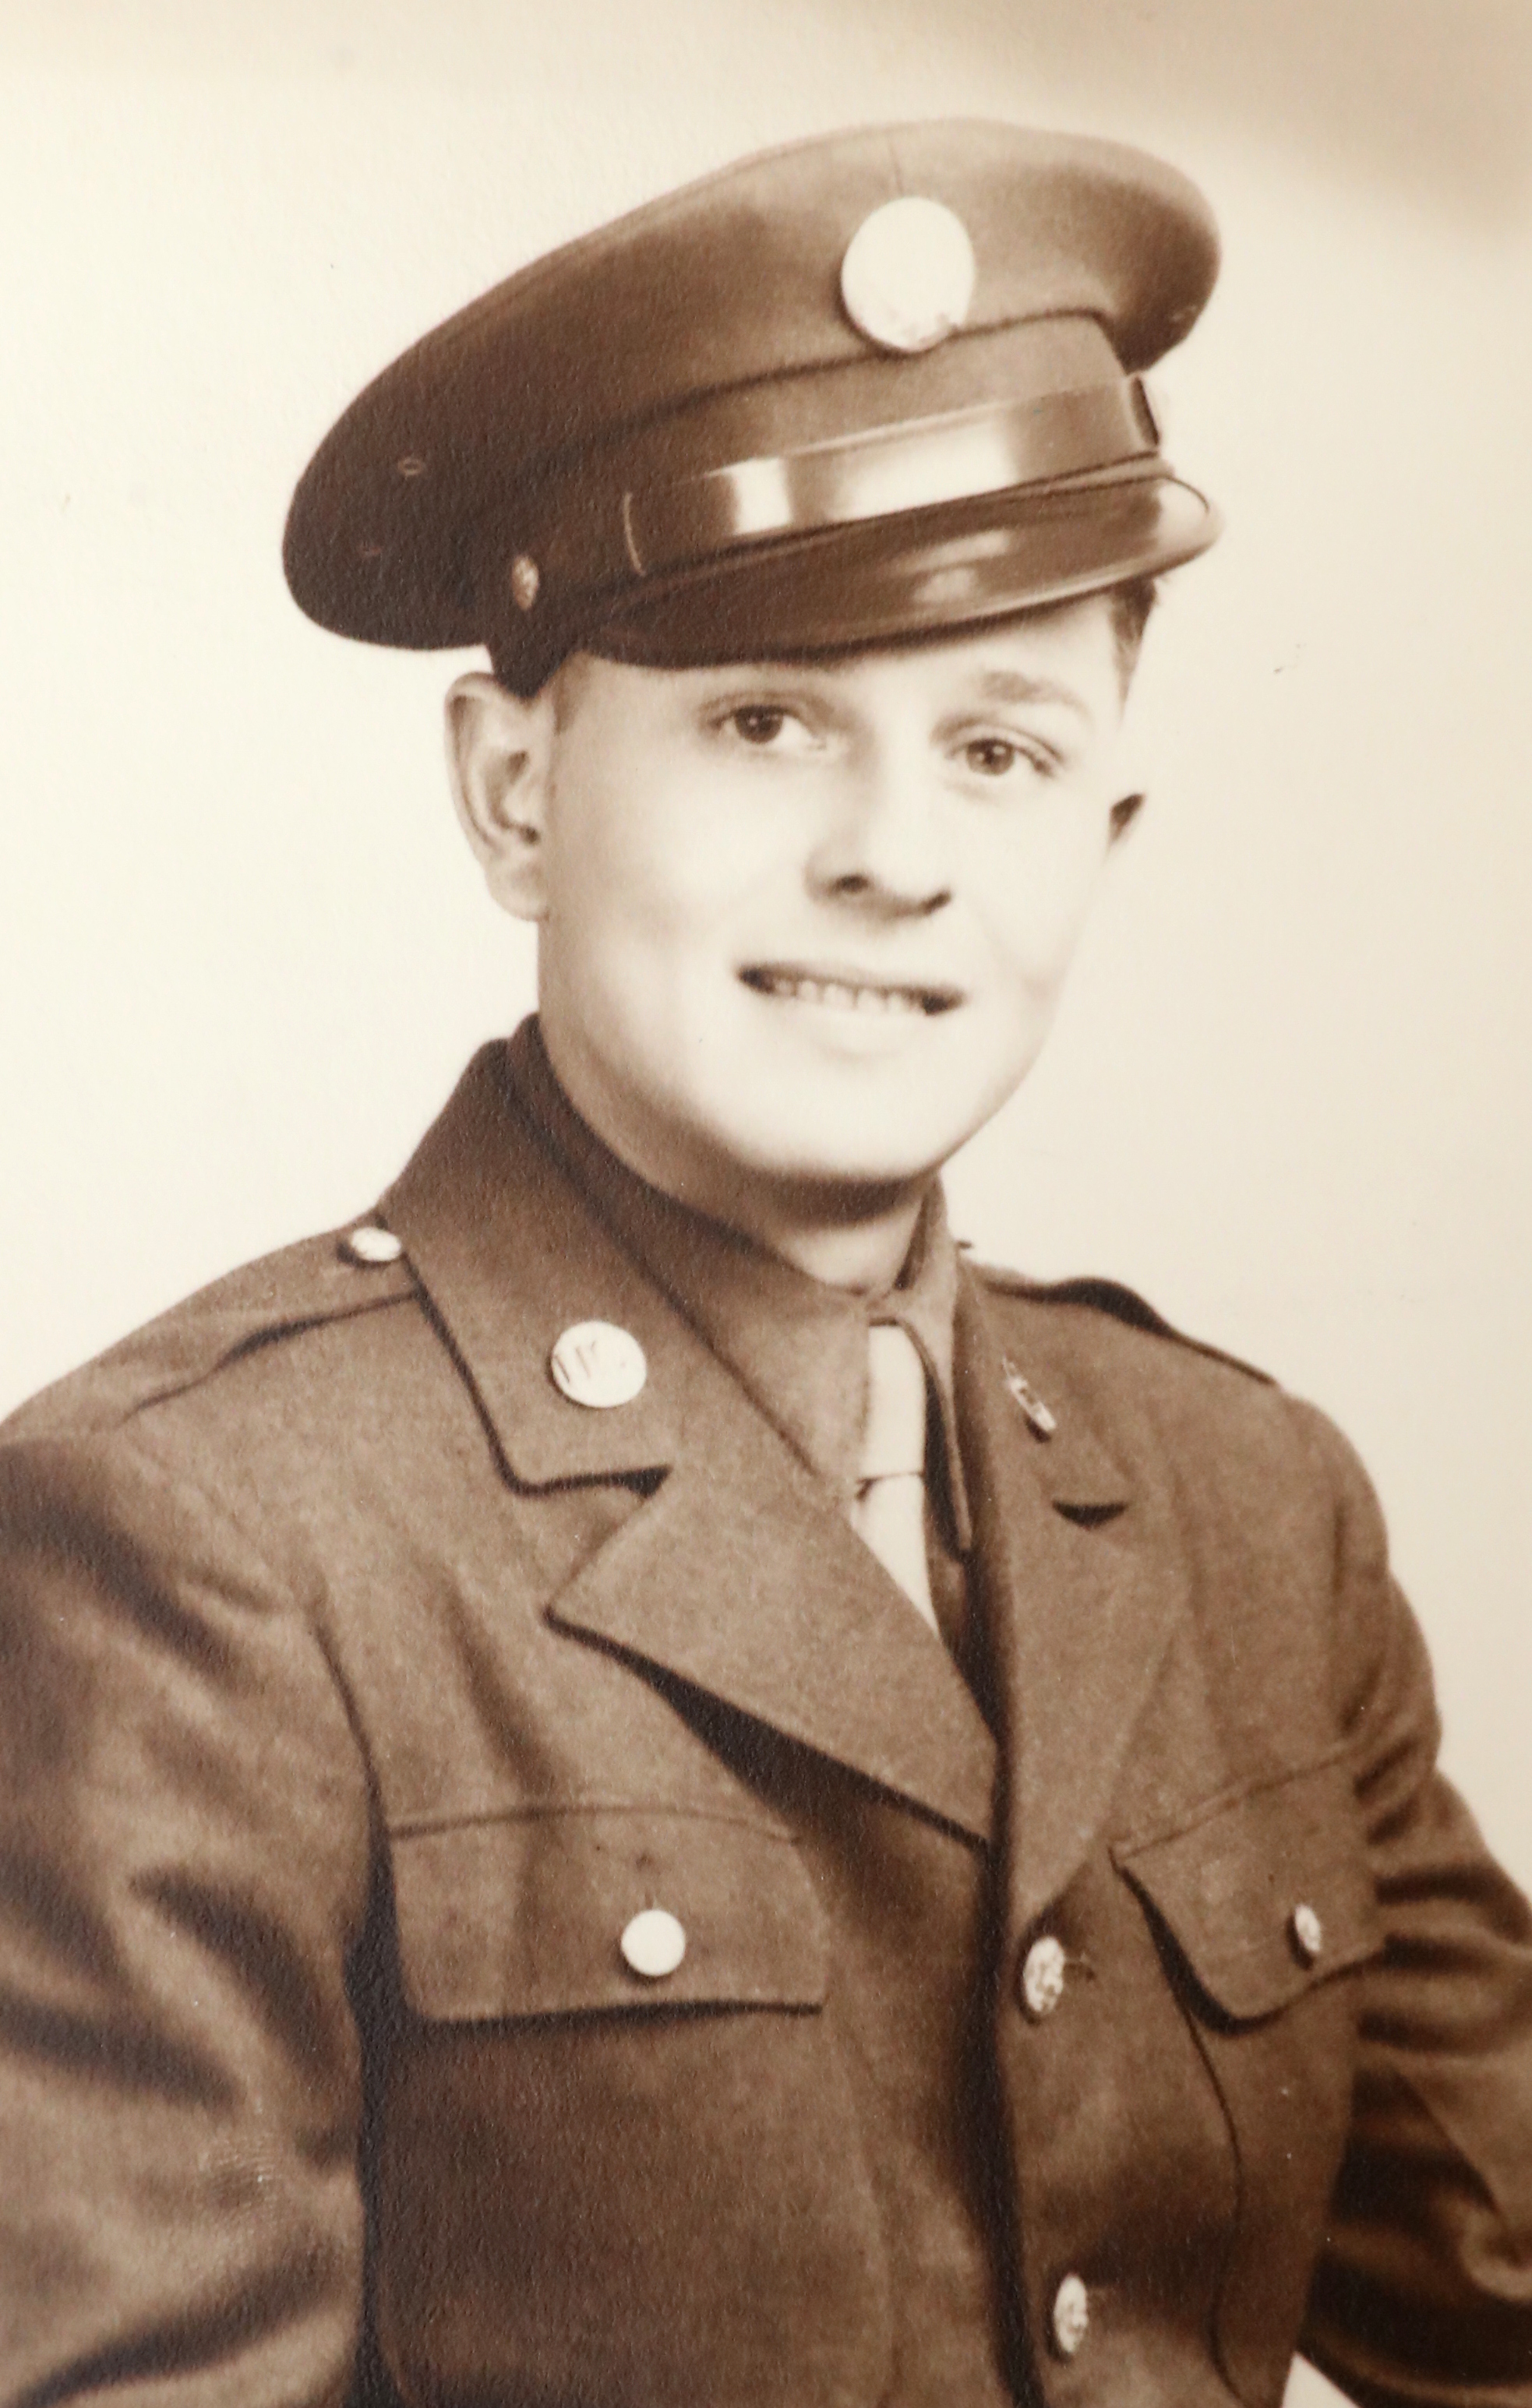 An act of cowardice still riles WWII veteran – The Buffalo News